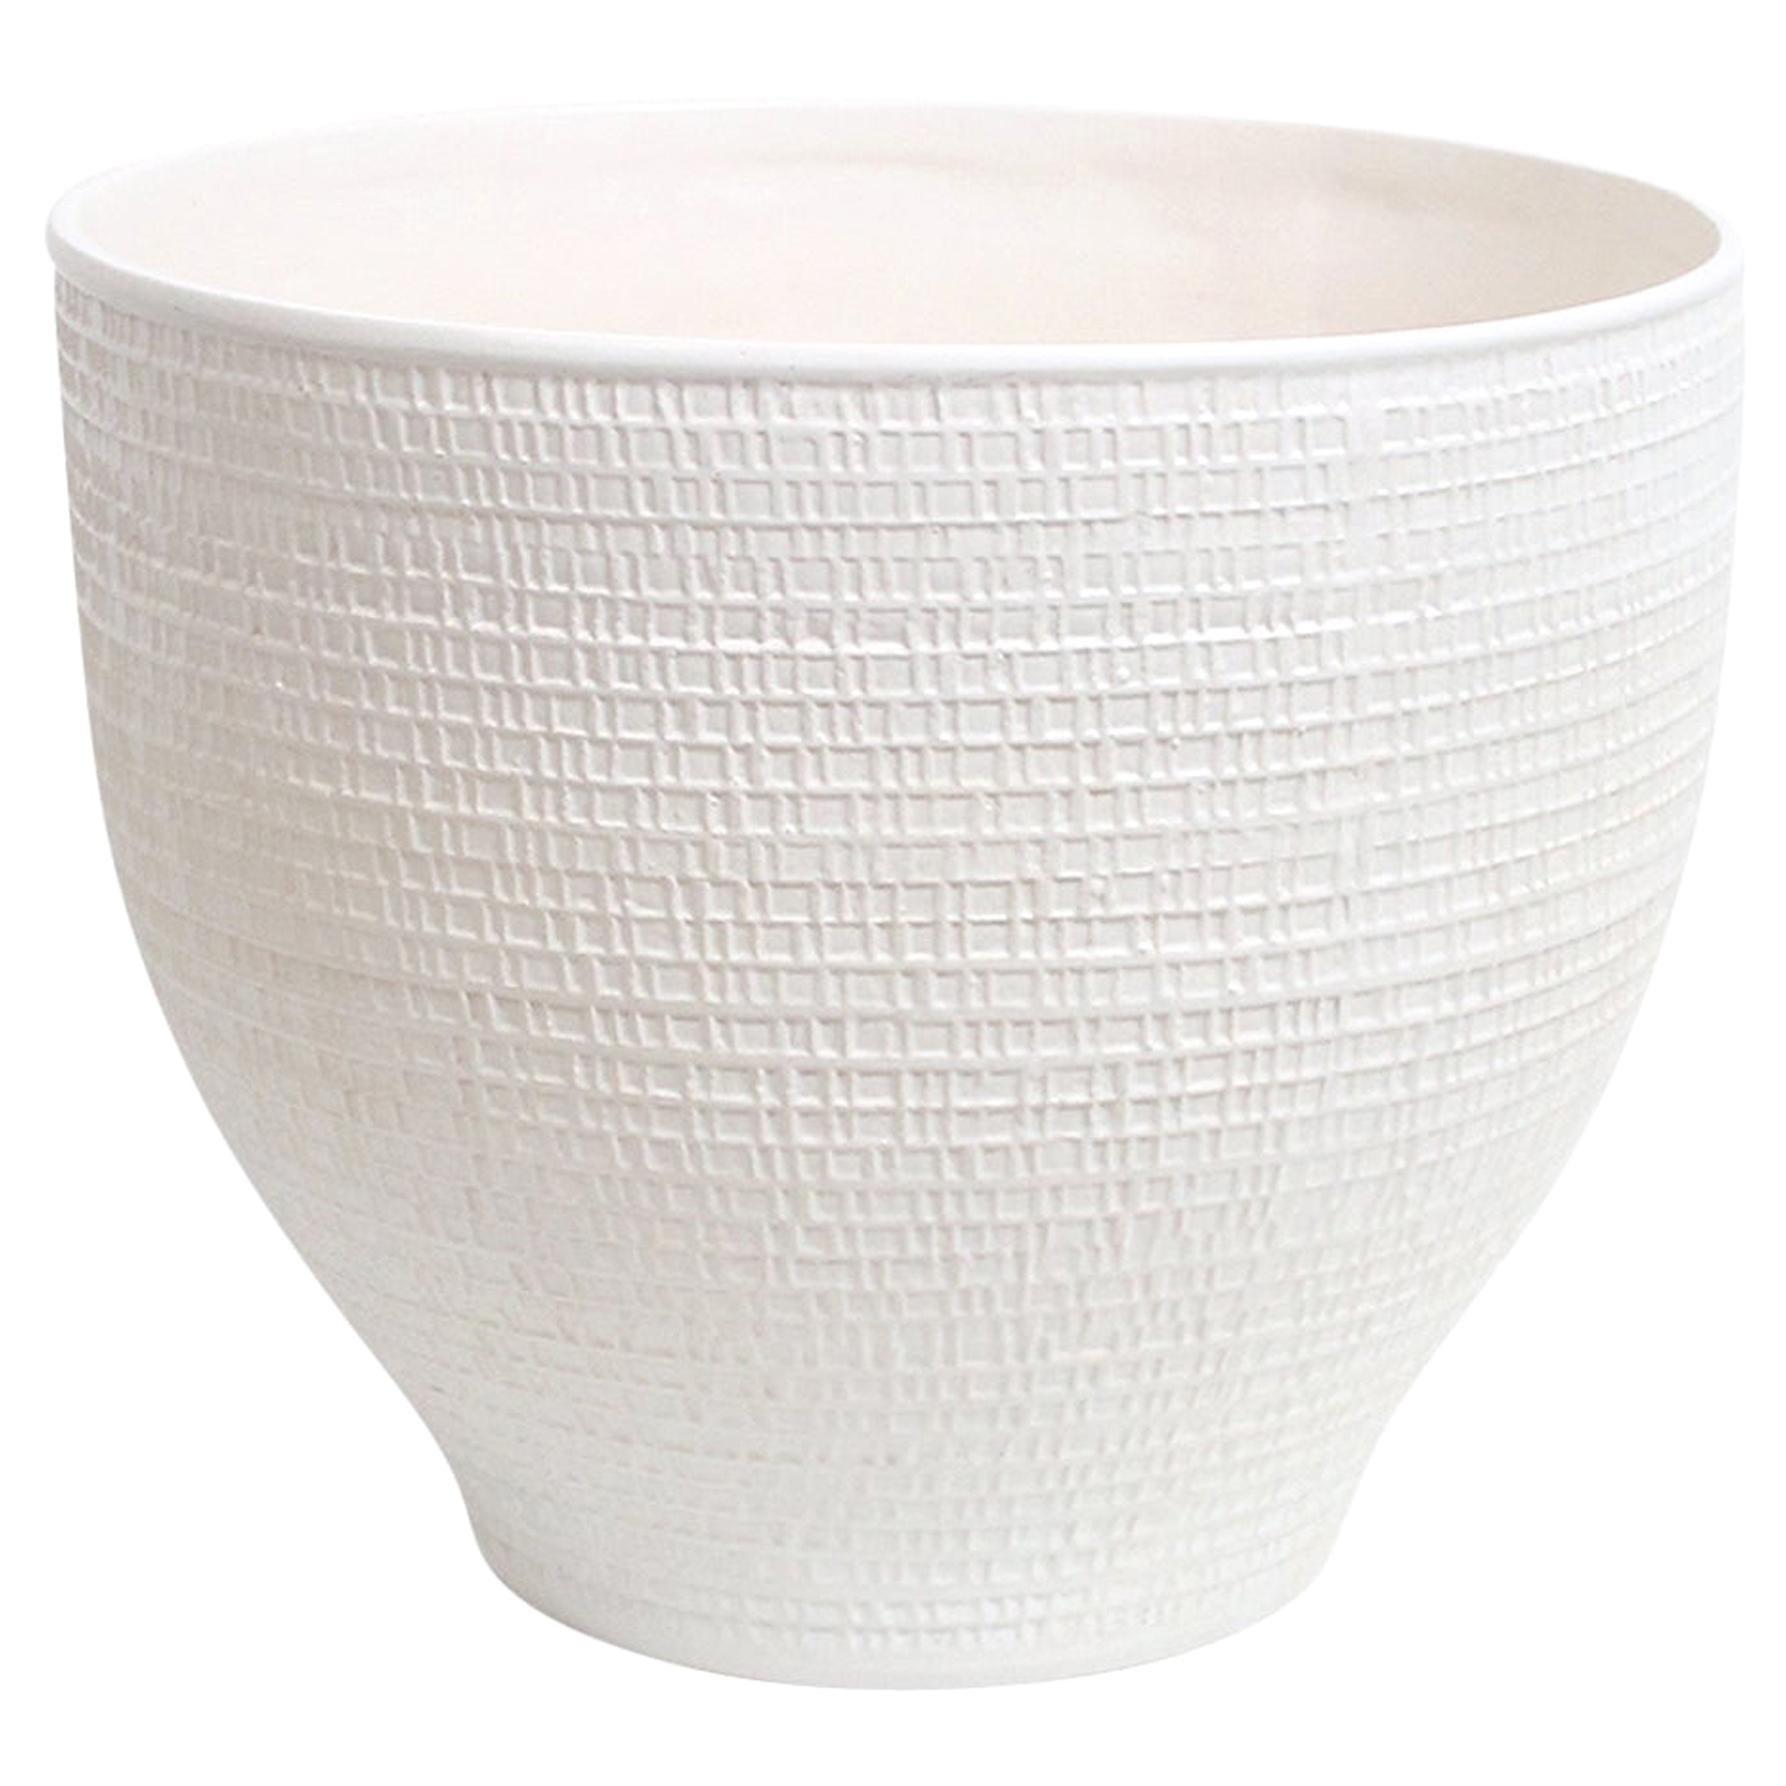 Monumental Ceramic Vessel by David Cressey